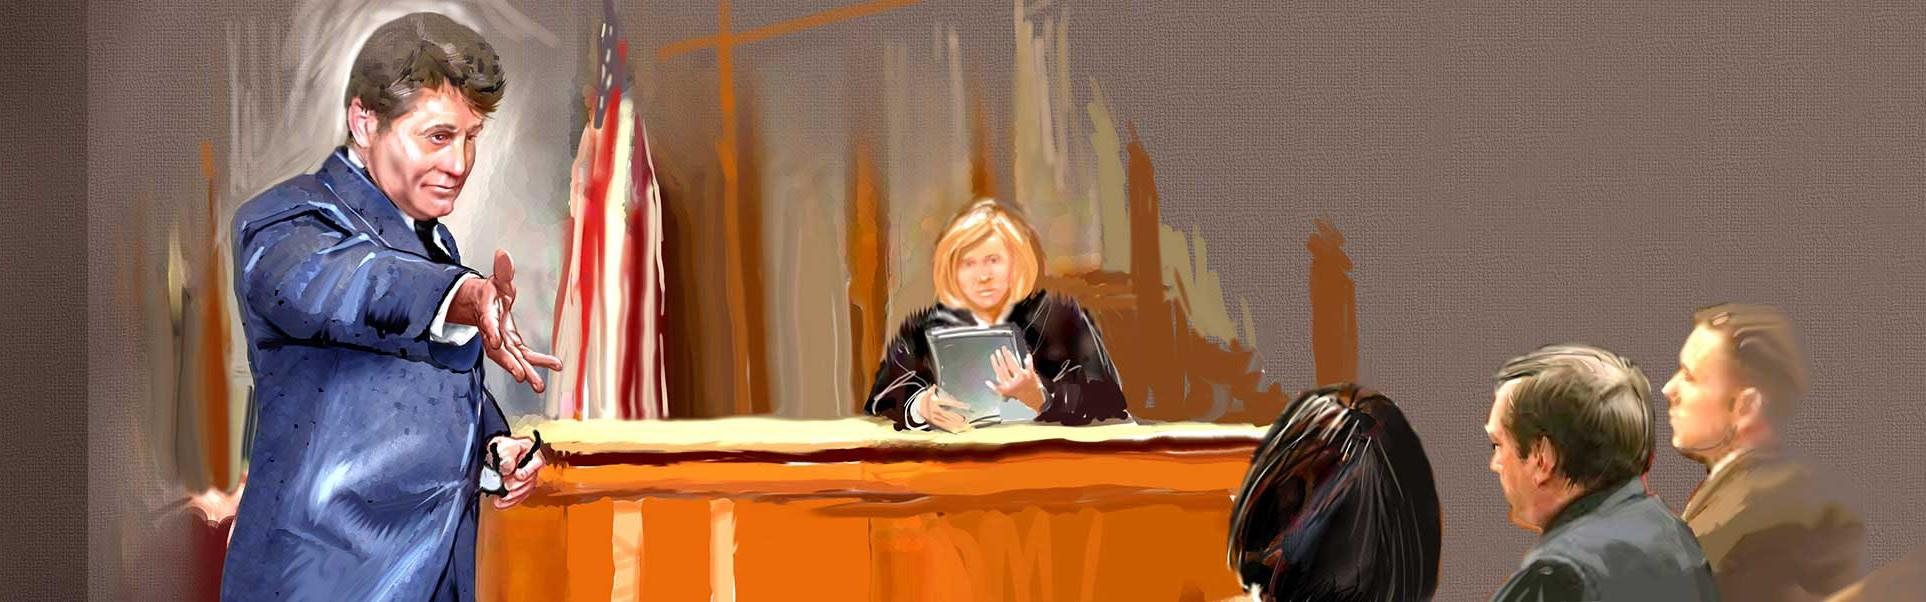 William-Cafaro New York Lawyer